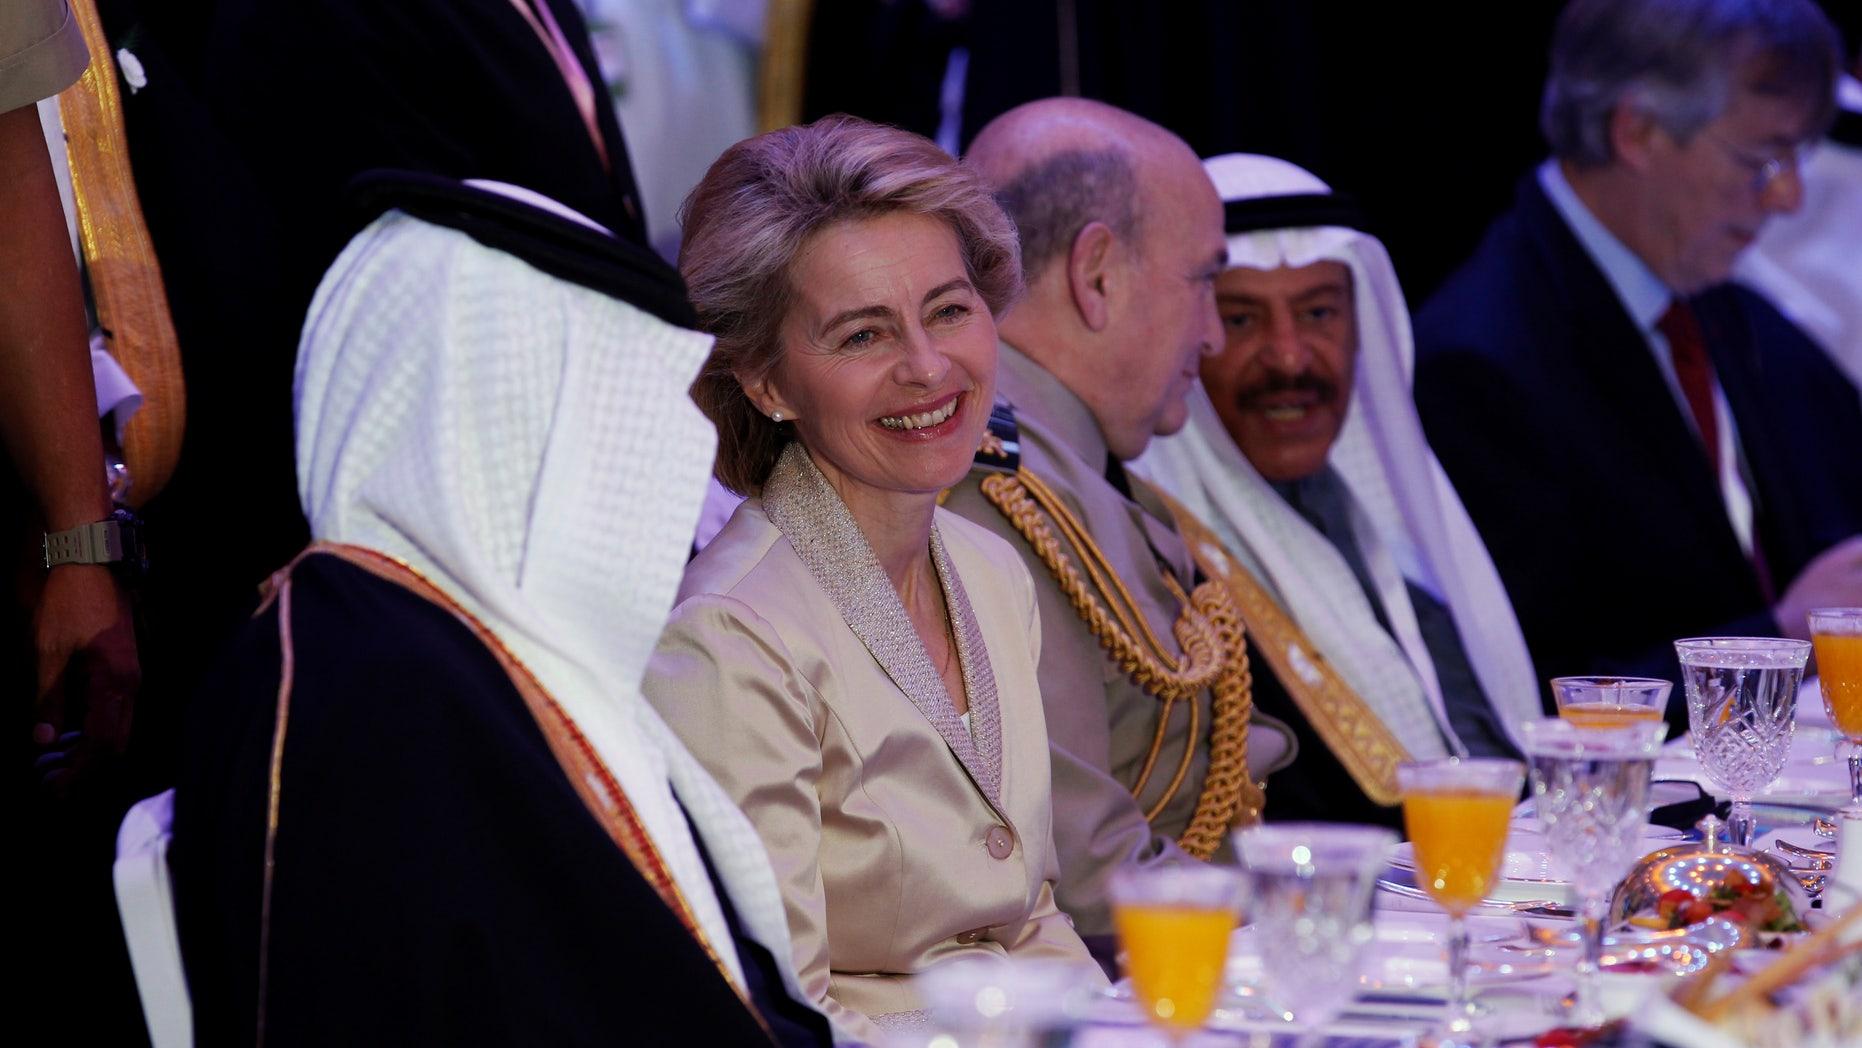 Germany's Defense Minister Ursula von der Leyen at a security summit in Manama, Bahrain, on December 9.